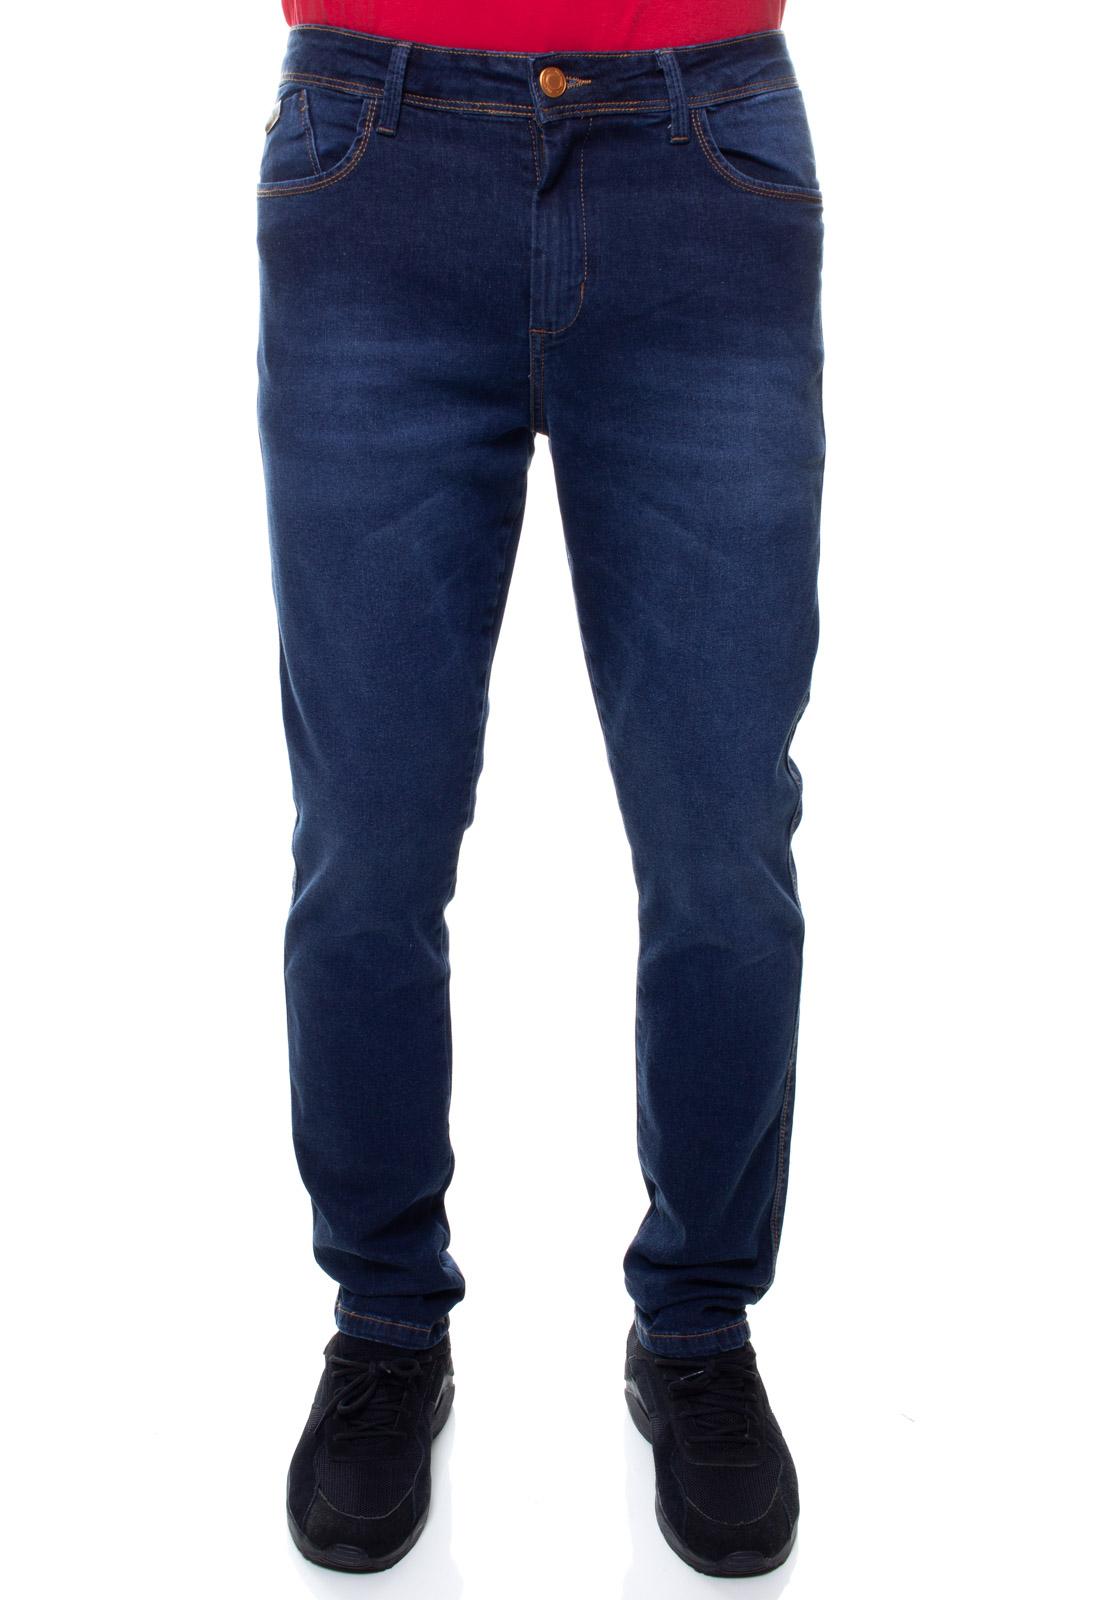 Calça Confort Jeans Masculina Crocker - 48110  - CROCKER JEANS